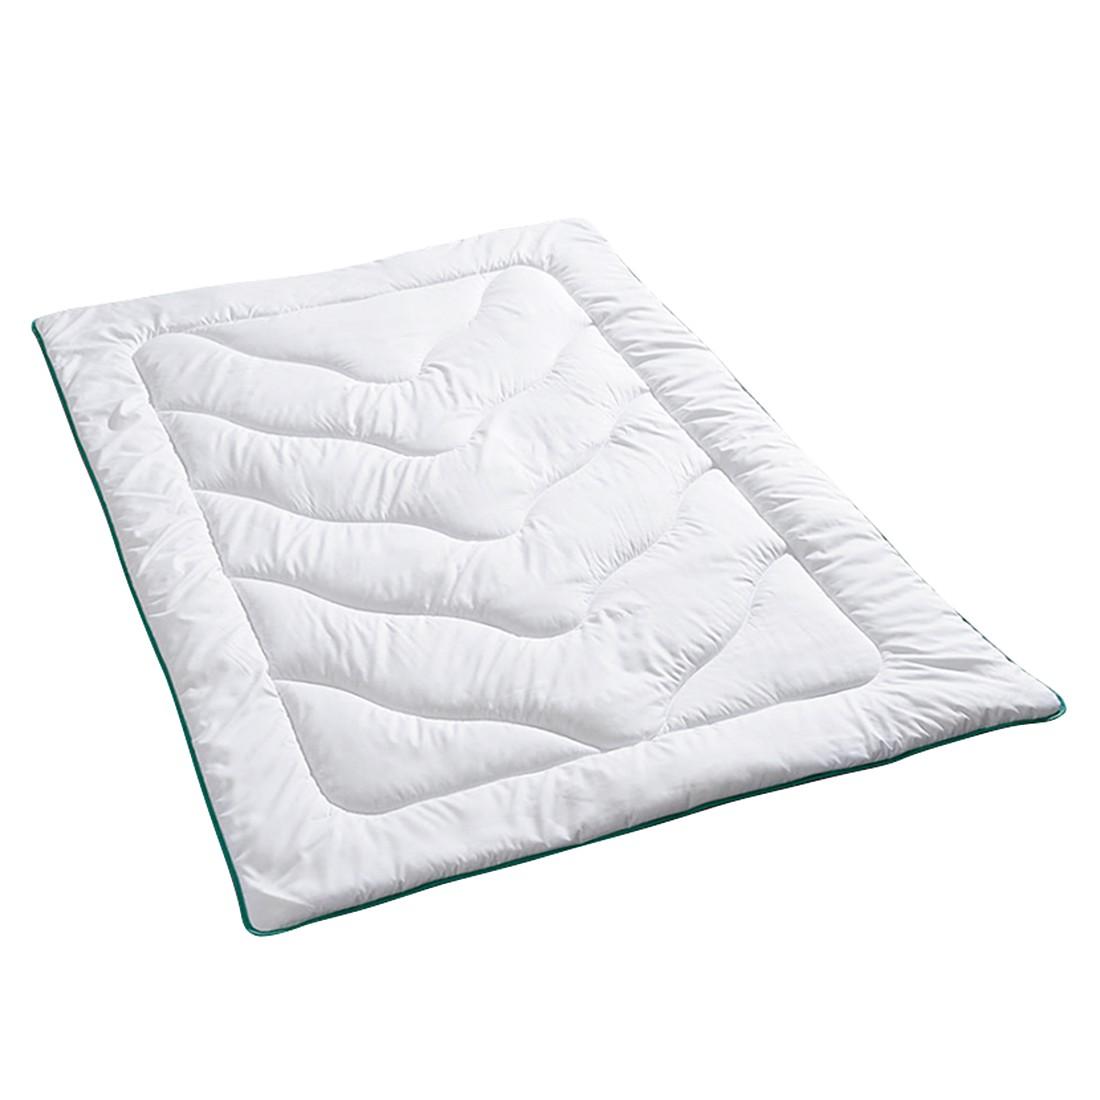 Bettwaren-Shop Sommerdecke cool touch – 100% Polyester Weiß – Ausführung 155×220 cm, Bettwaren-Shop jetzt kaufen